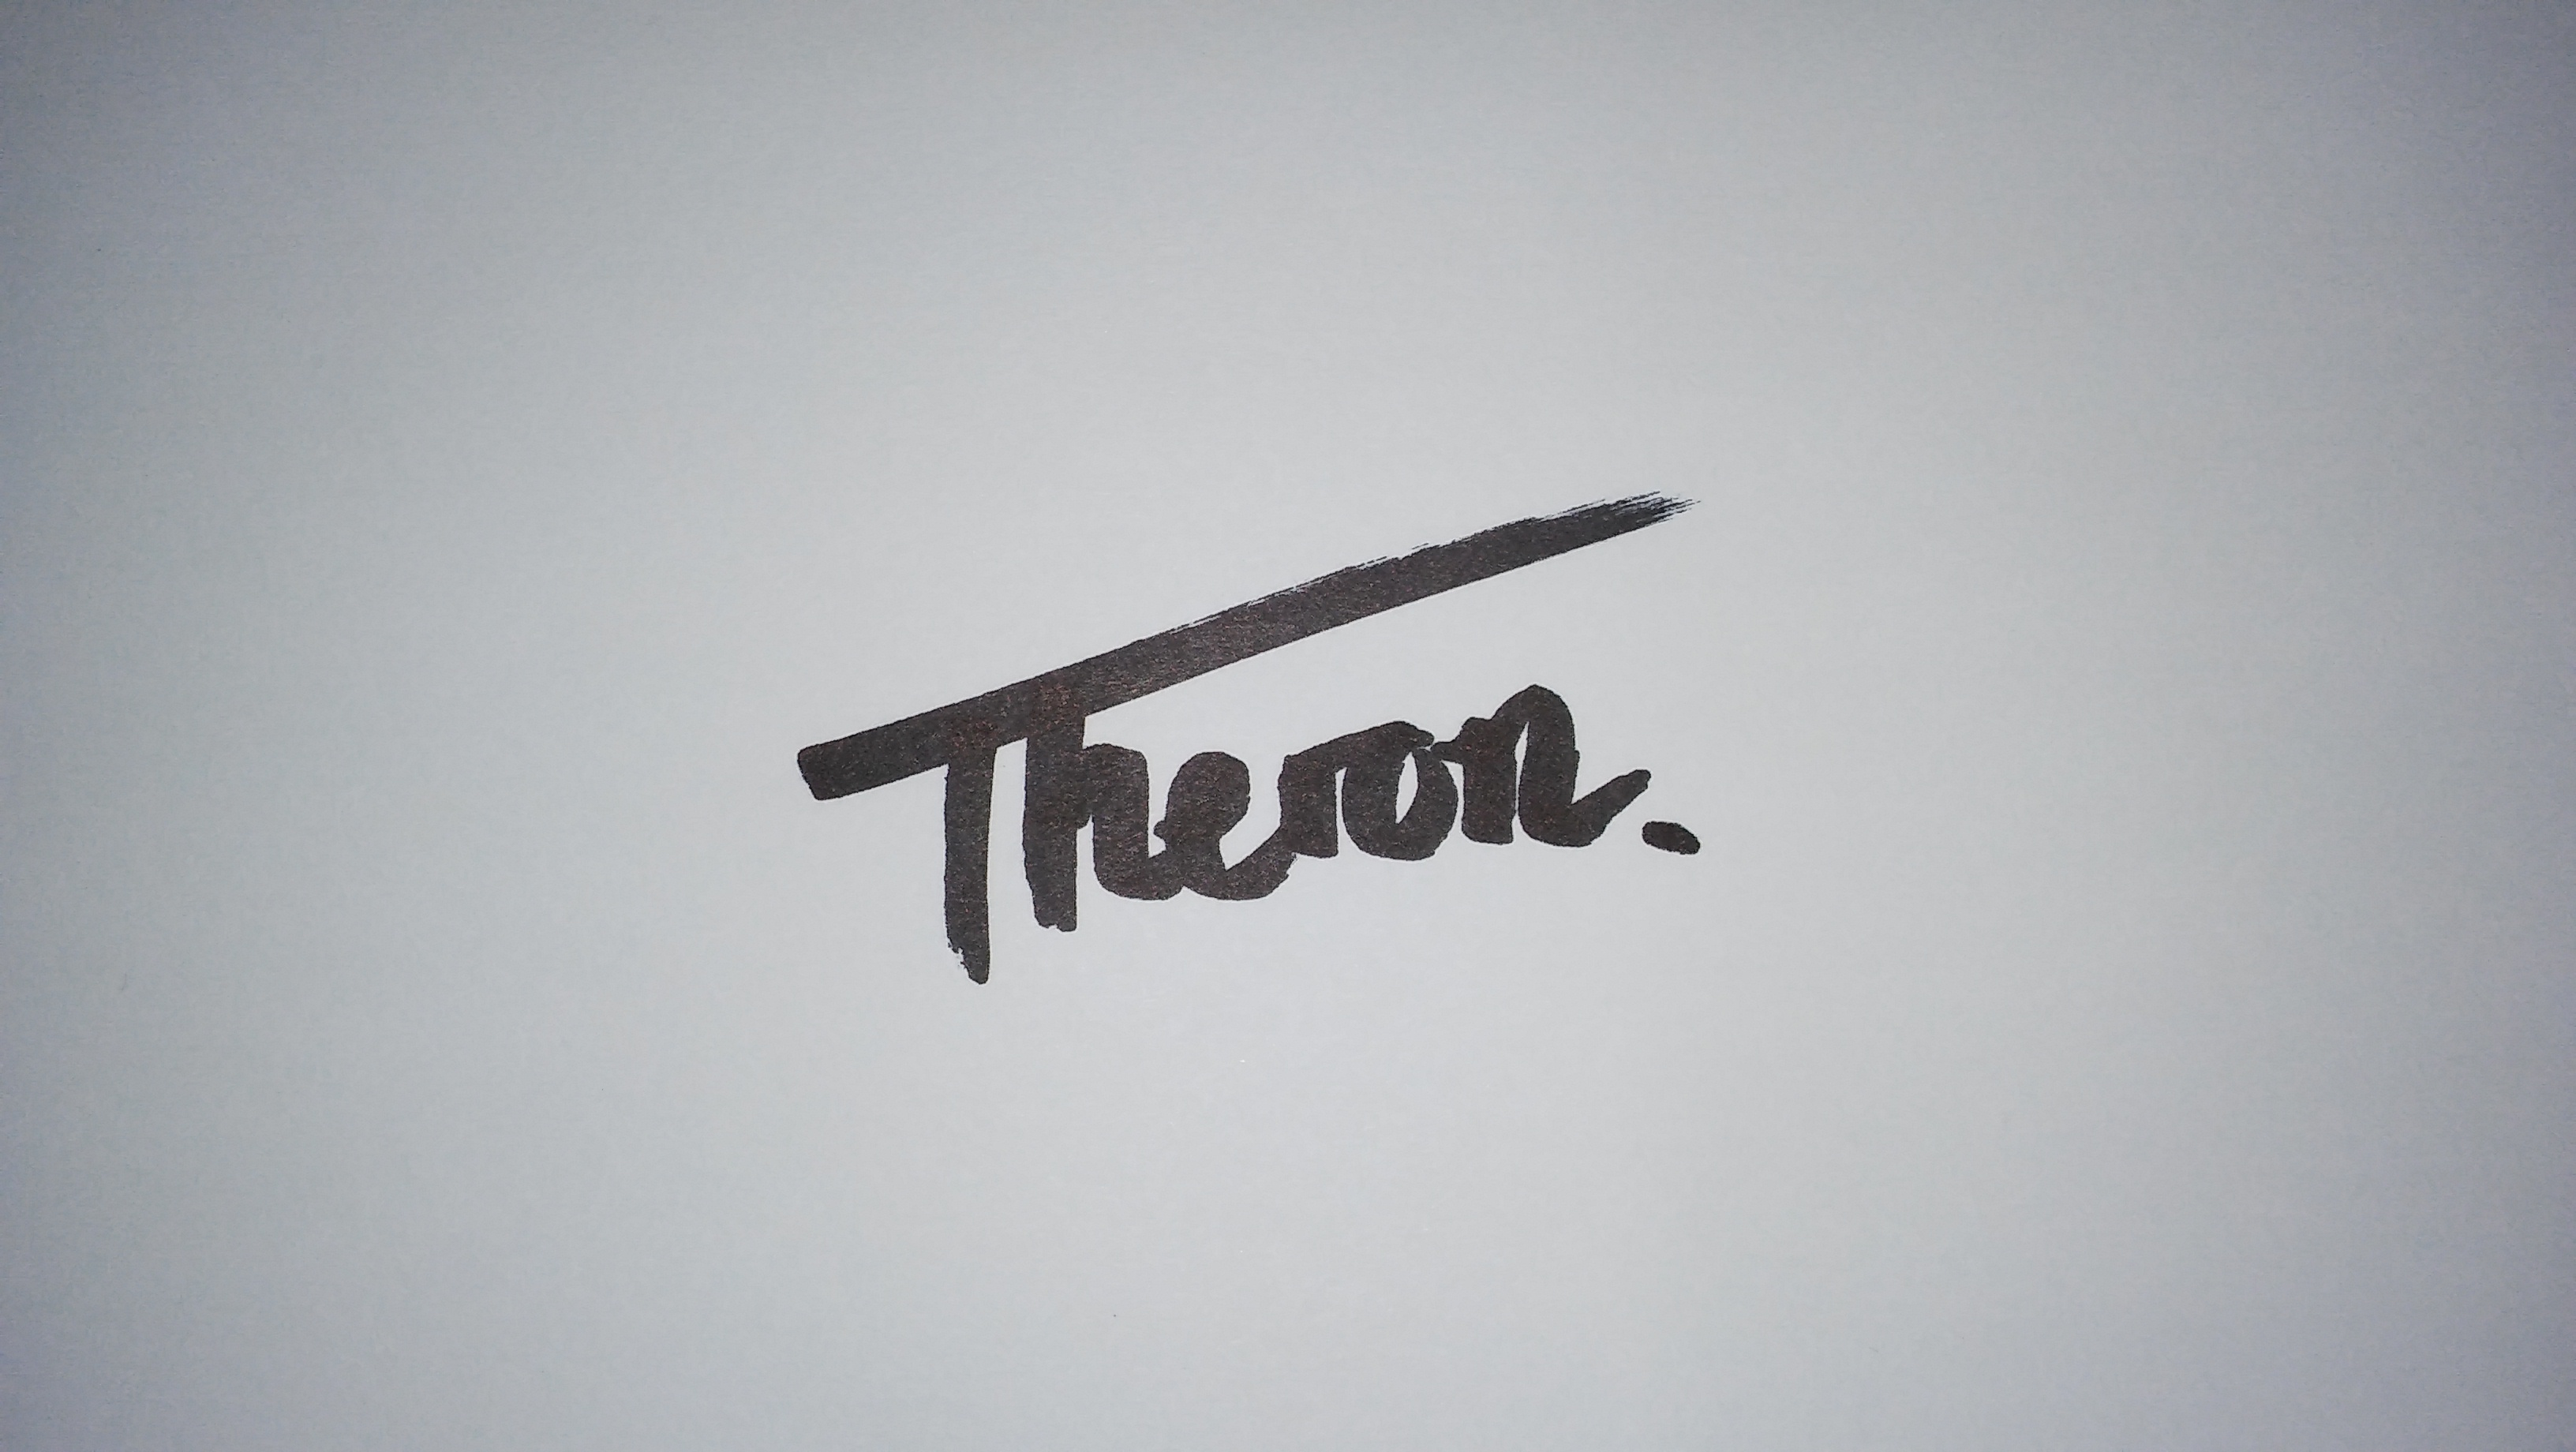 hendrik theron Signature